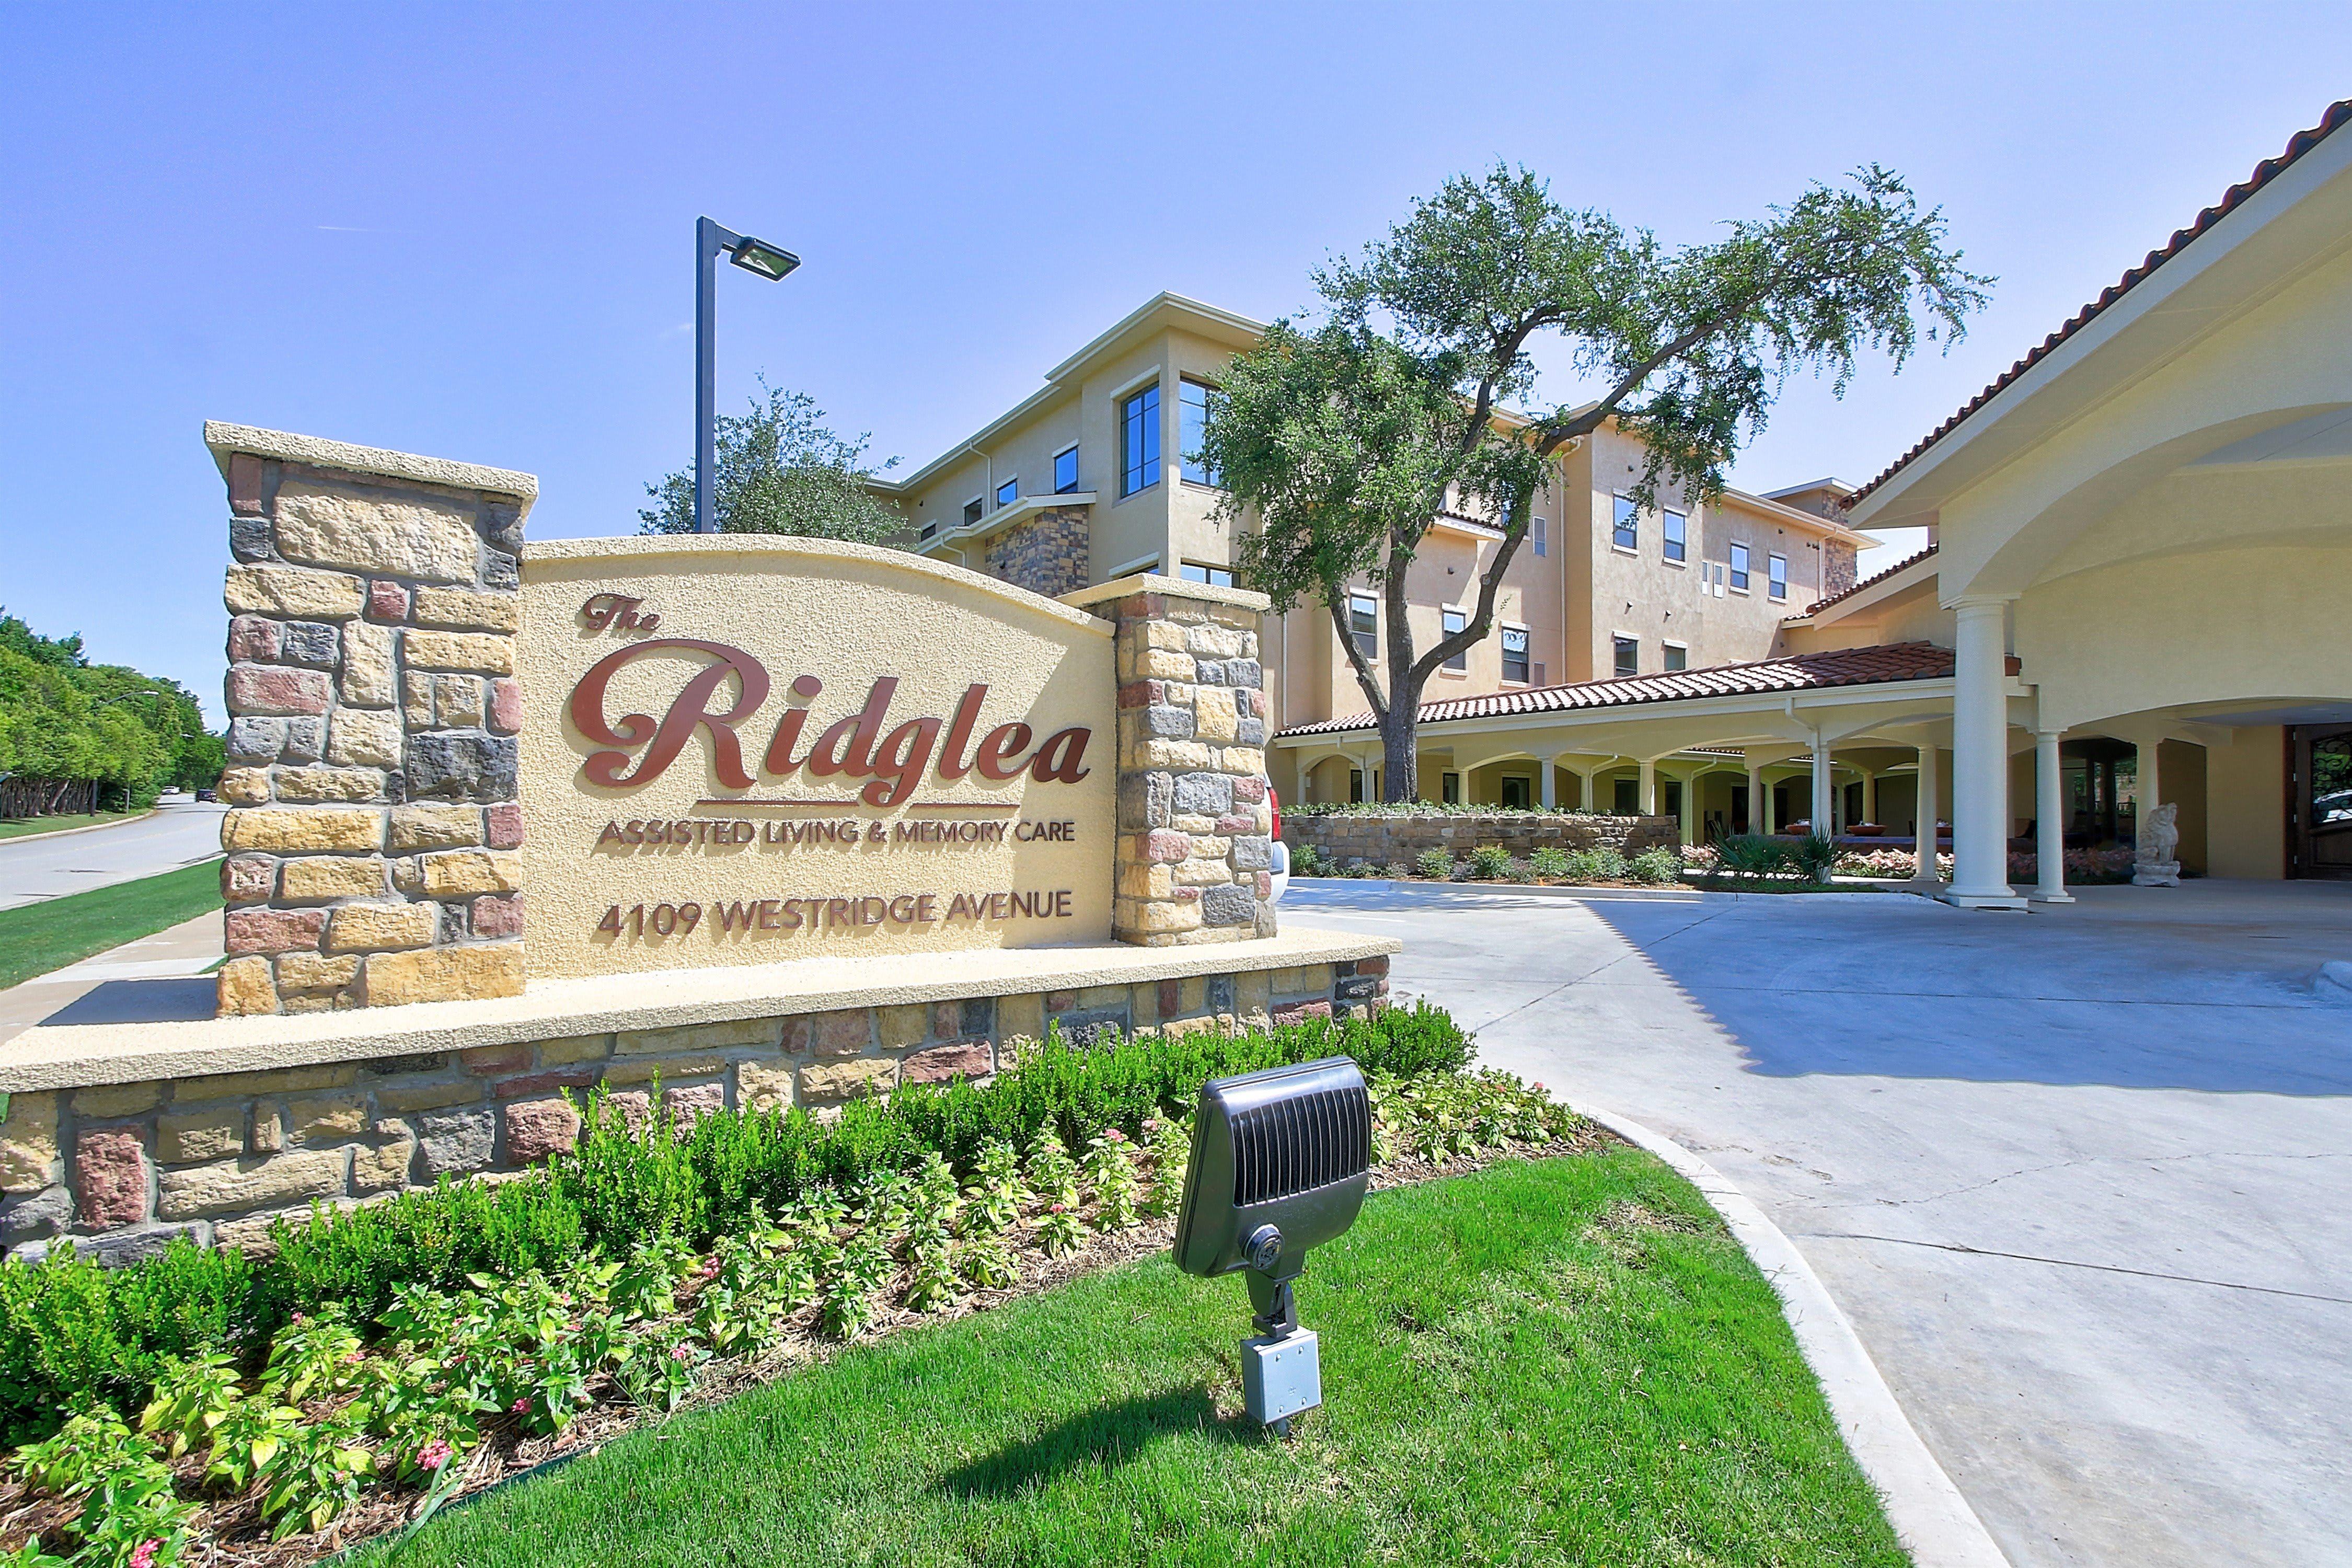 Photo 1 of The Ridglea Assisted Living & Memory Care